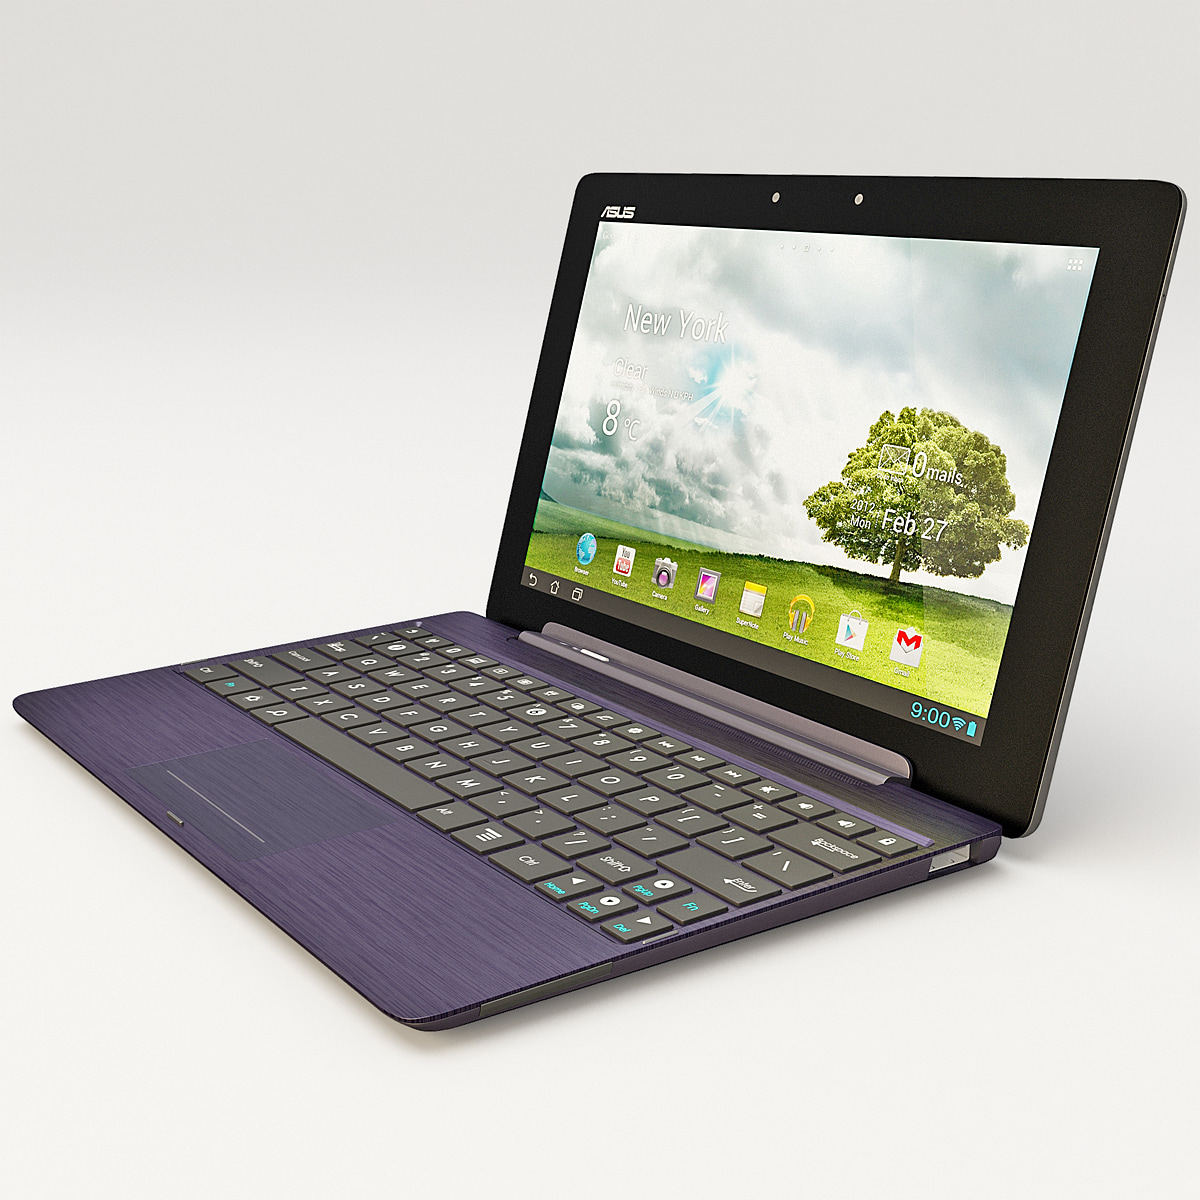 Tablet Asus Transformer Pad Infinity Set_2.jpg